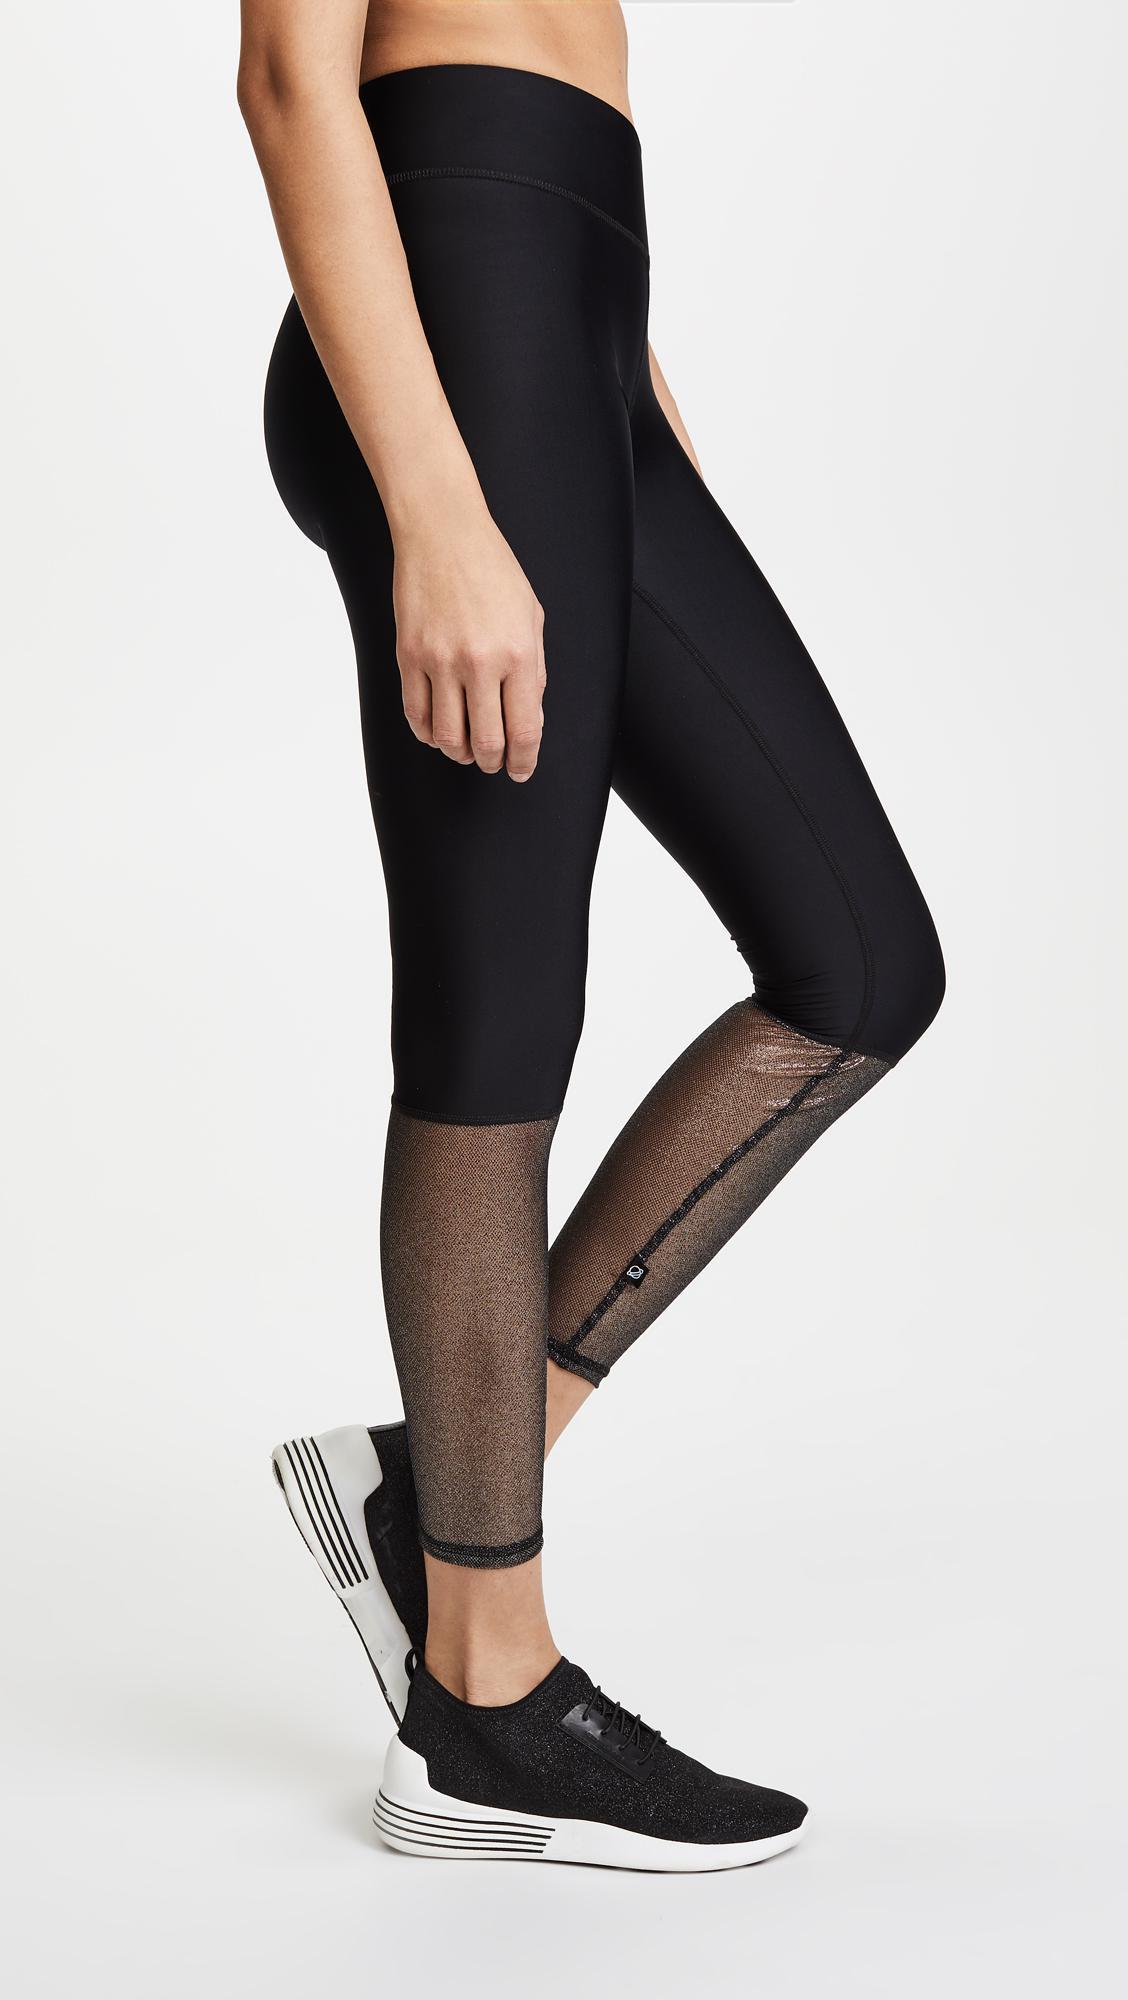 Lyst - Terez Glitter Mesh Leggings in Black 667b7327a7b4